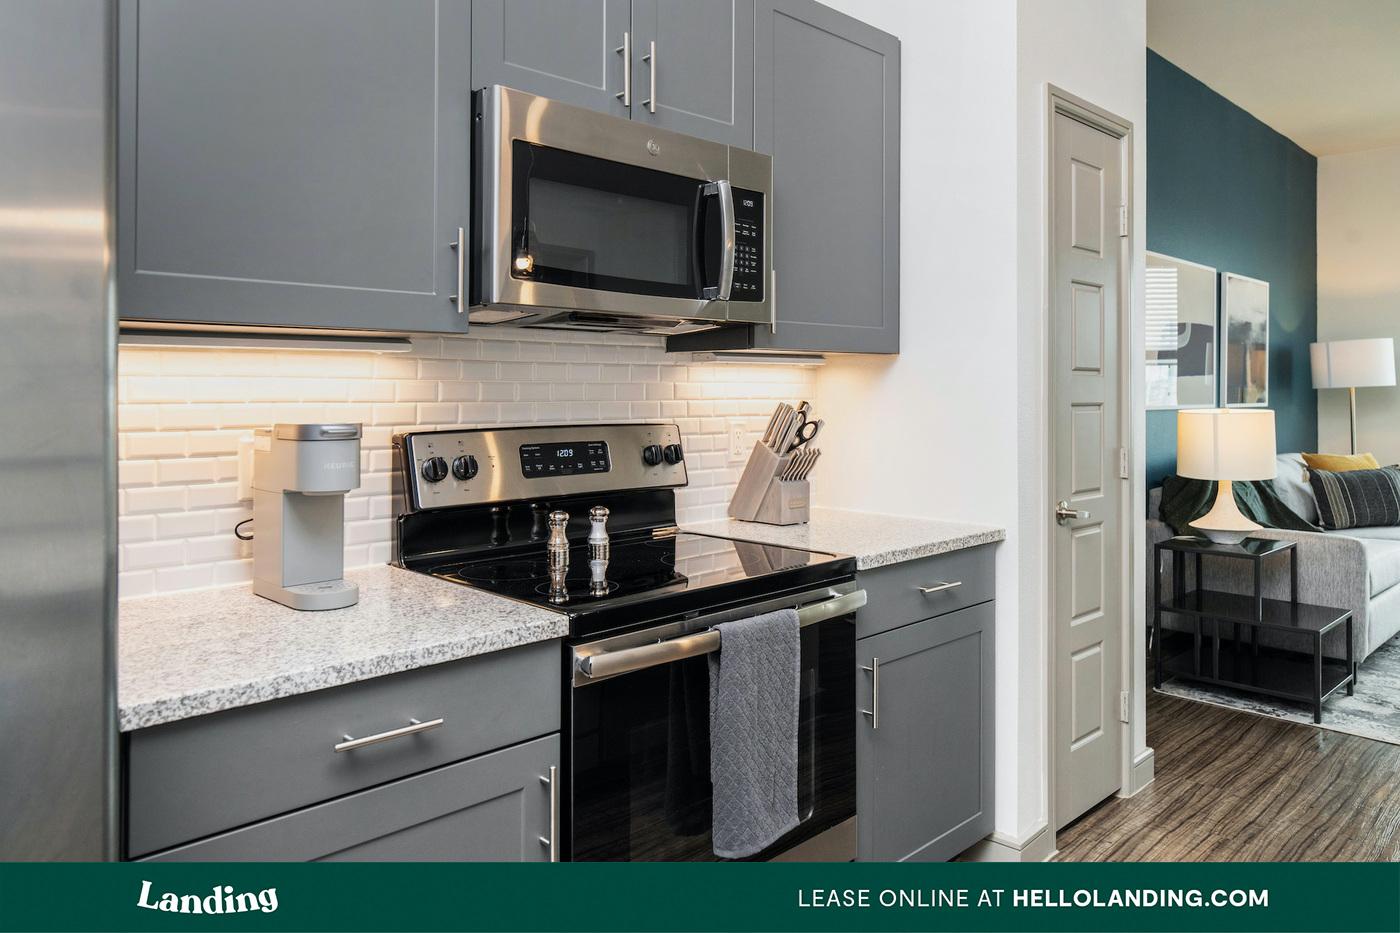 Butler Cabana 203 for rent